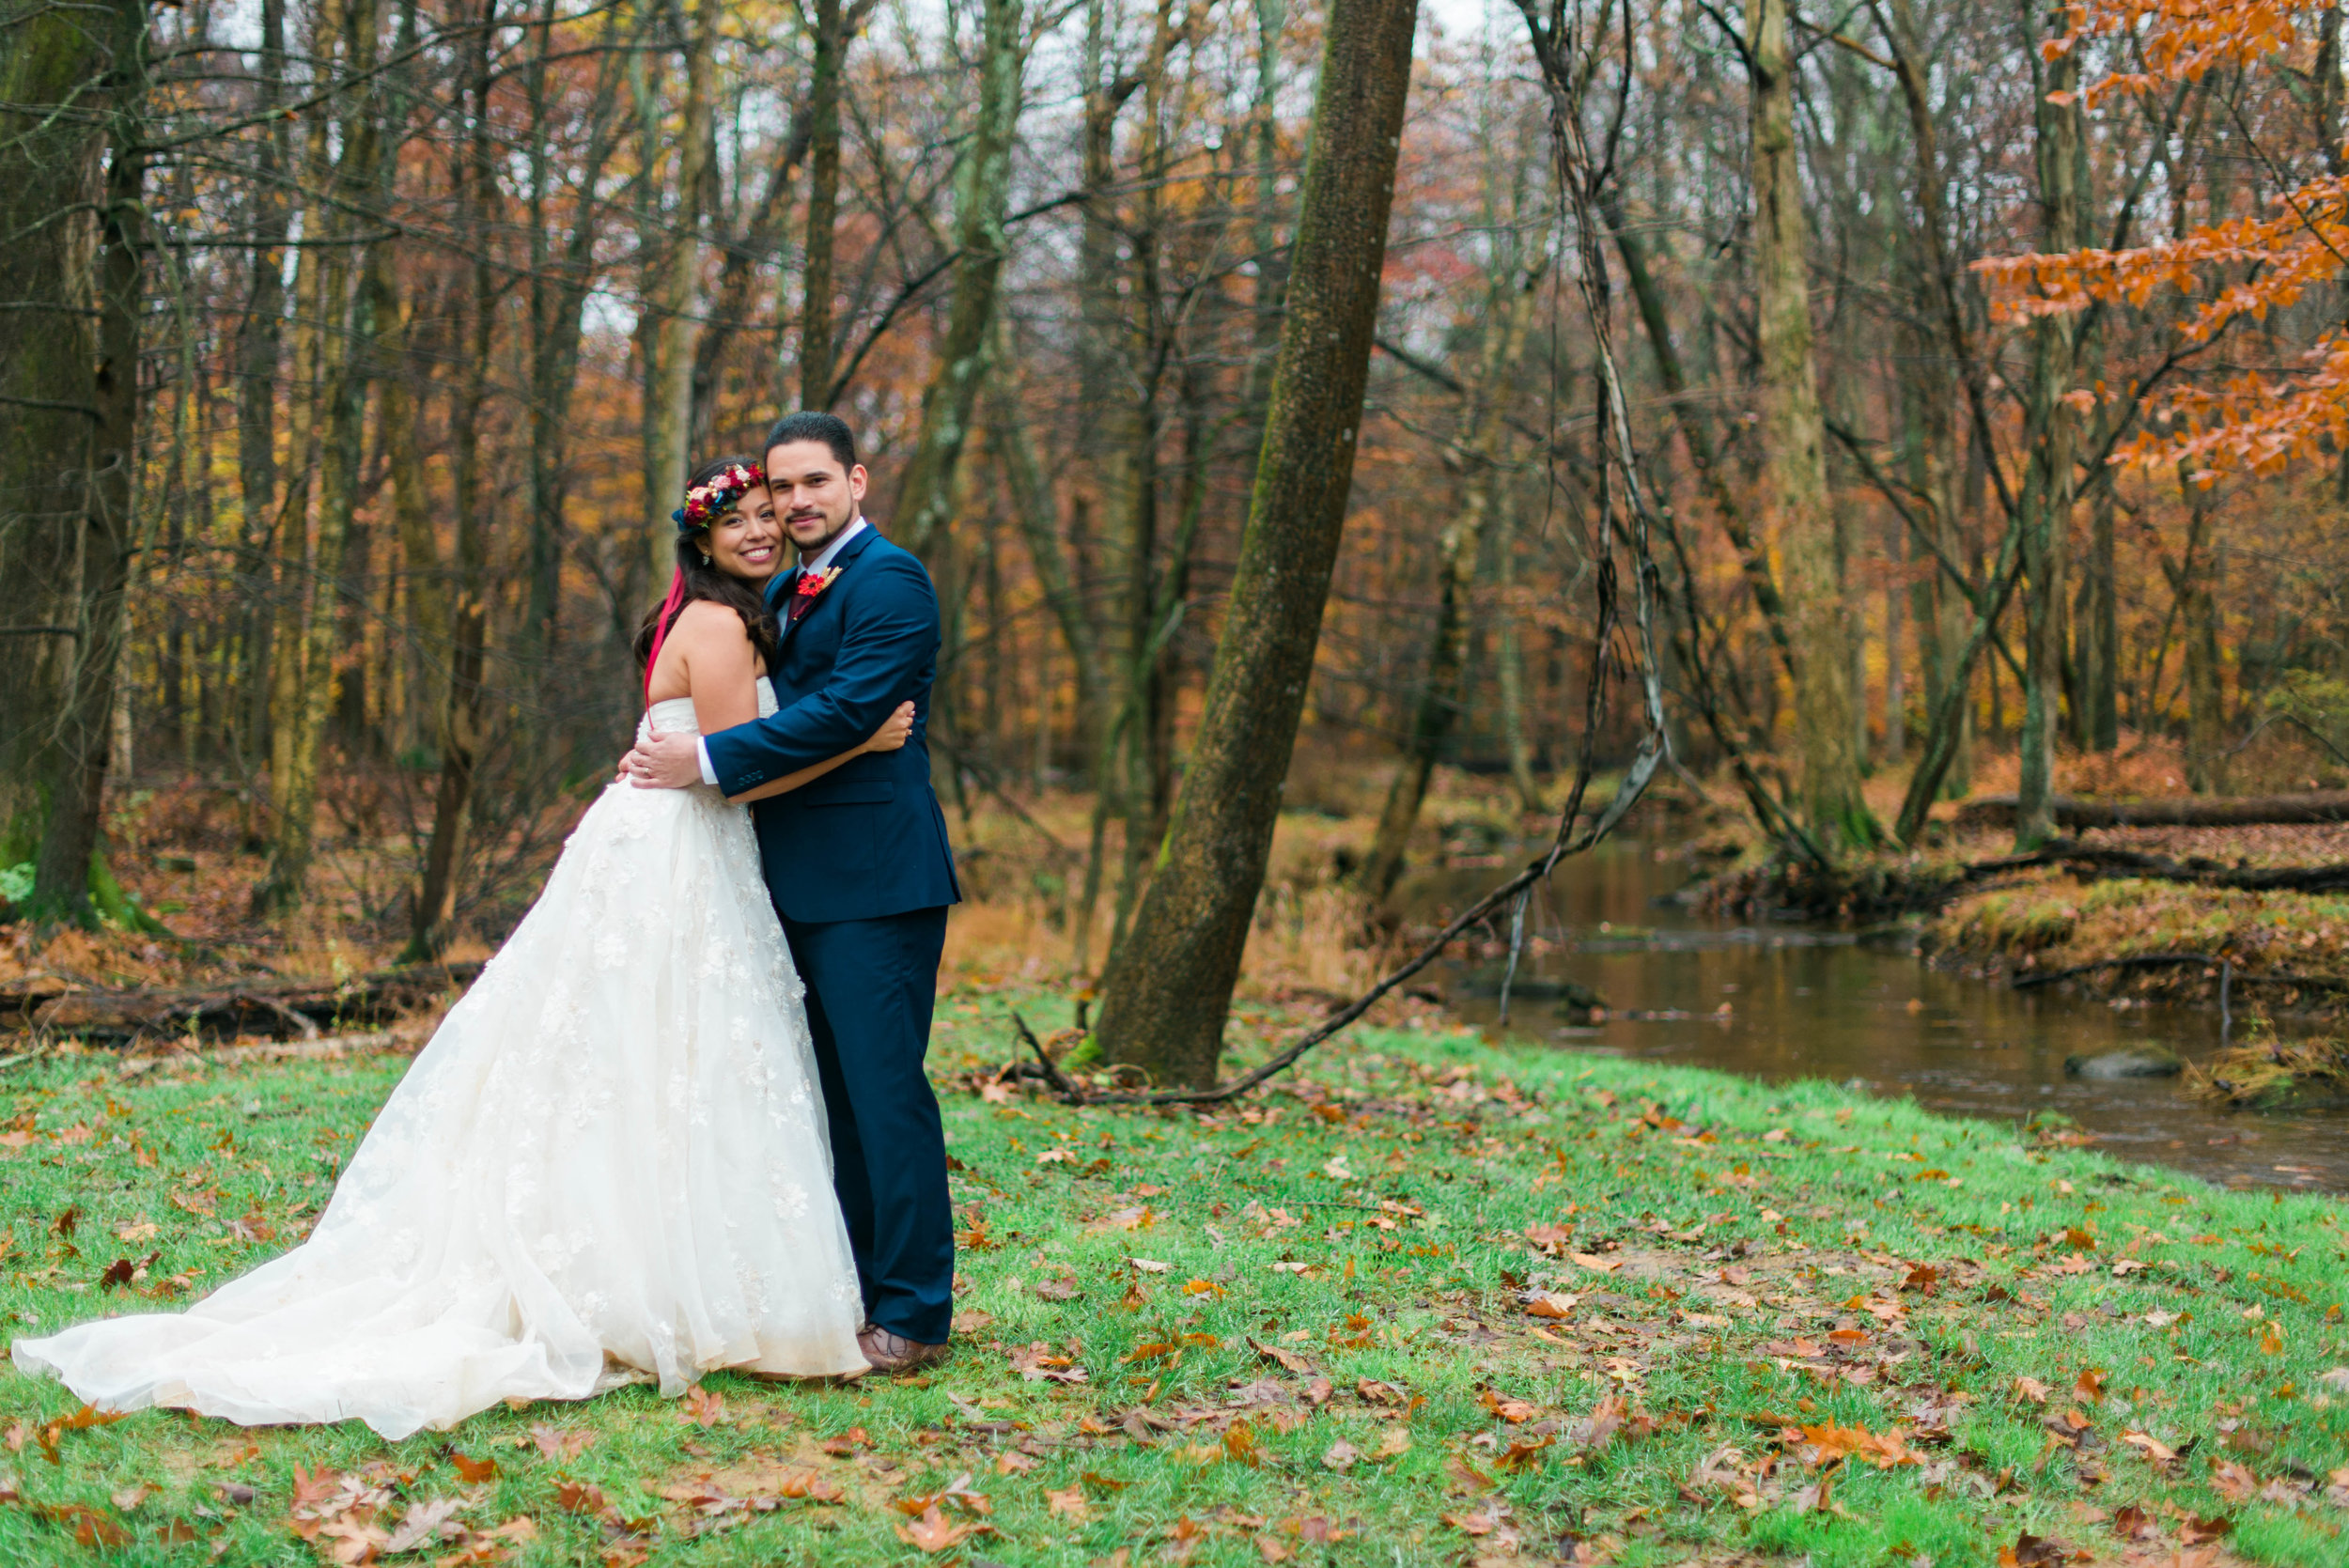 caboose-farm-Sabillasville-MD-wedding-icaimages-foggy-wedding